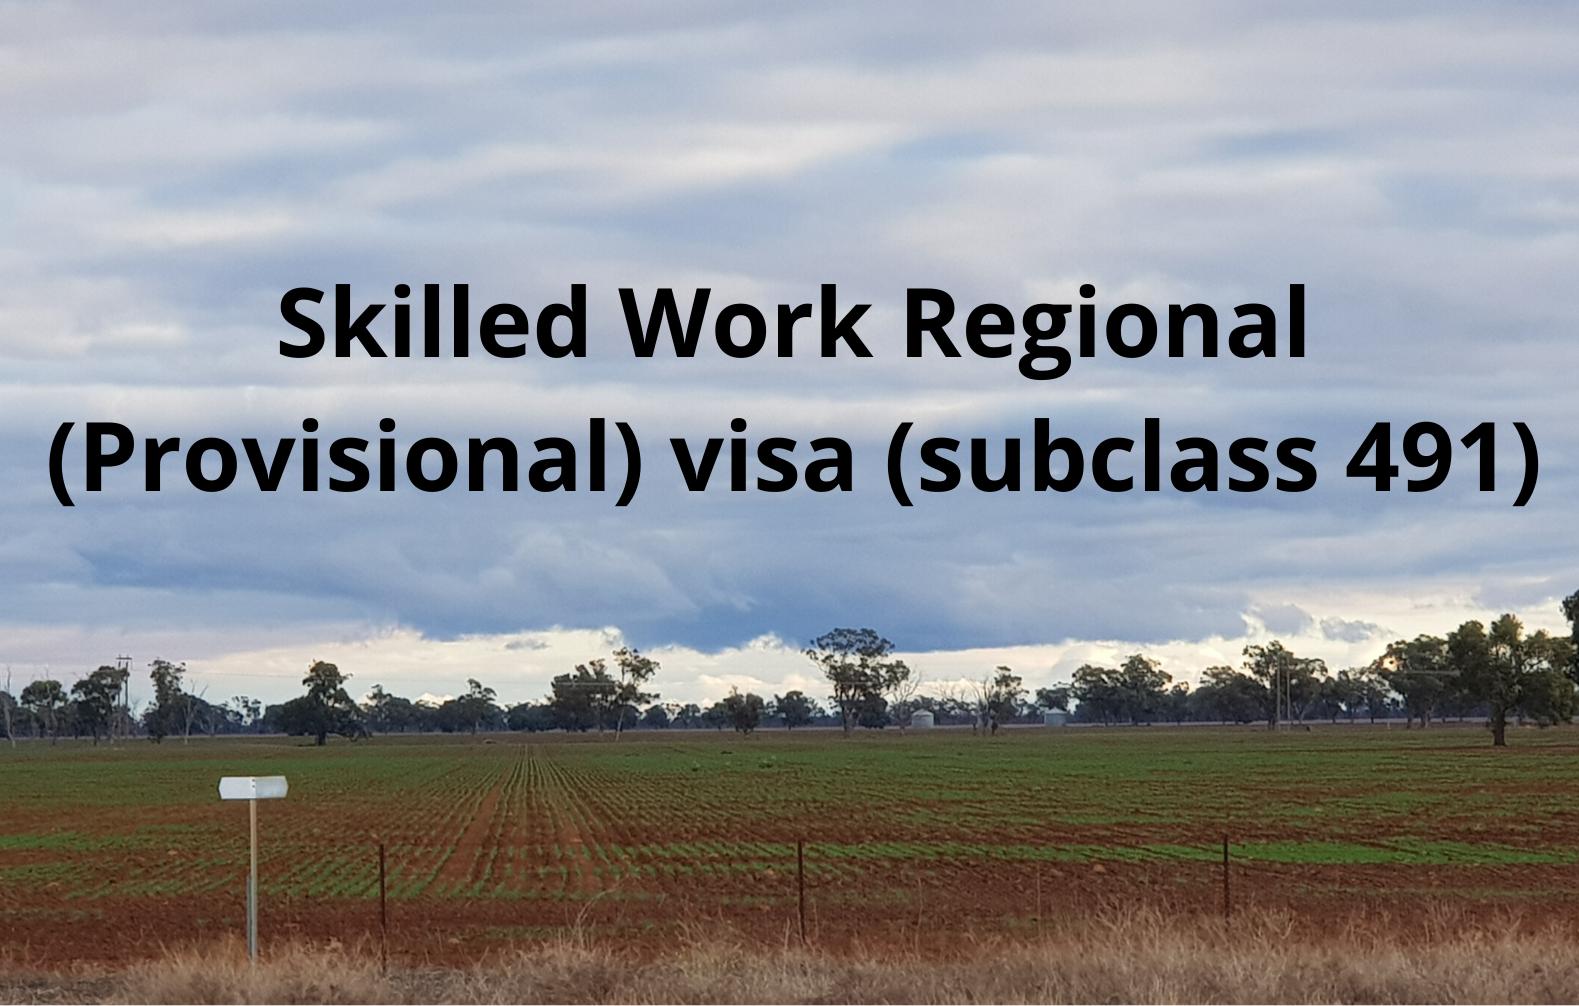 Nyngan Cotton Farm Orana Region of central New South Wales _Skilled Work Regional visa (subclass 491) Photo Rishi Acharya